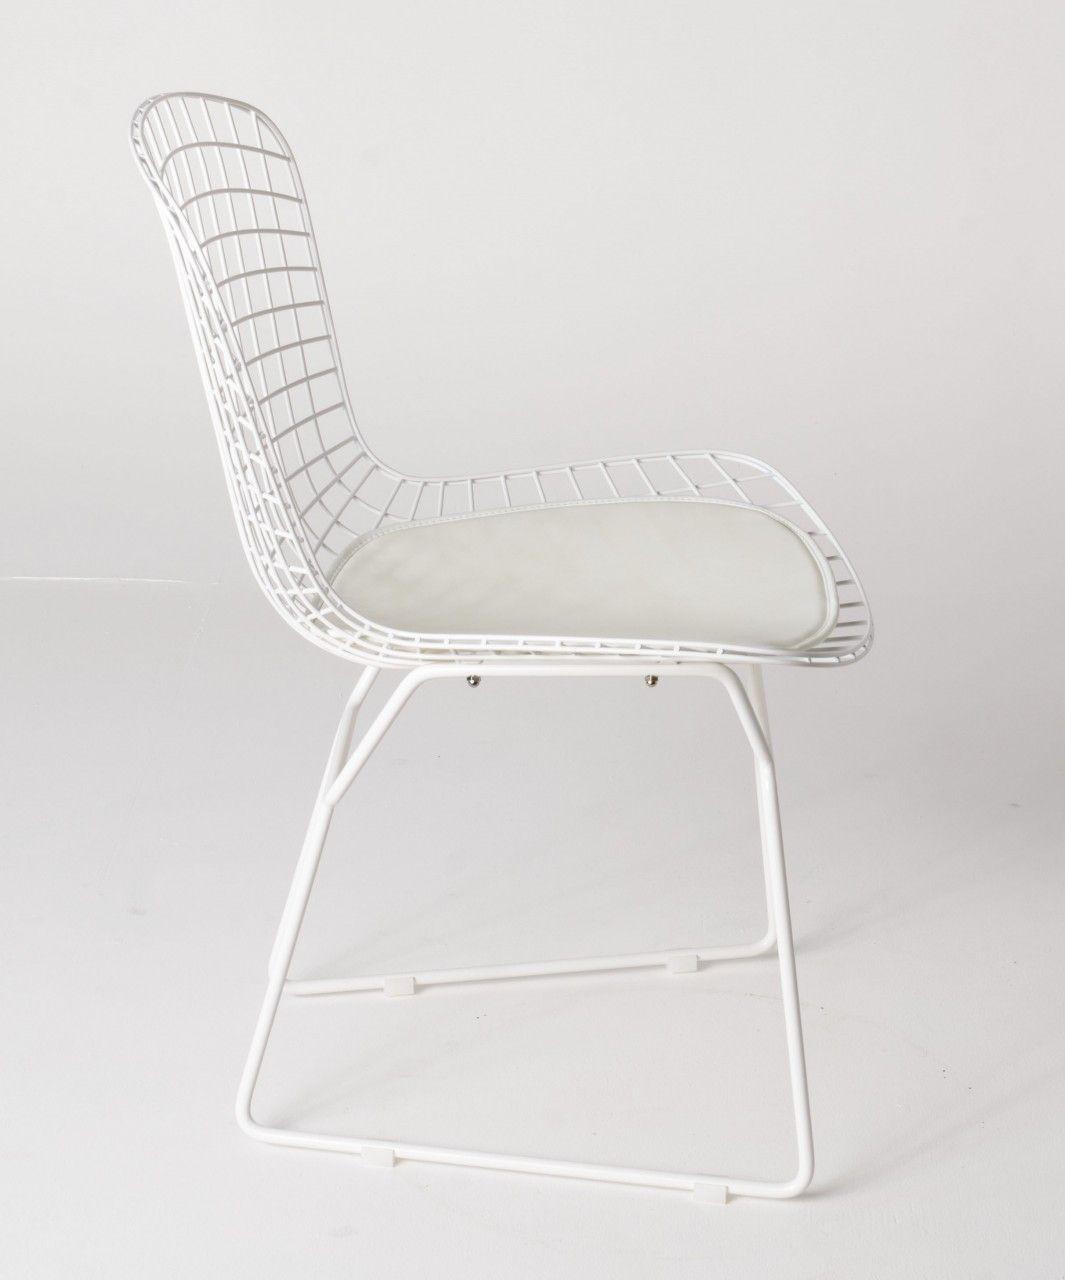 Milano Republic Furniture - Replica Harry Bertoia Bird Chair white powdercoated with white cushion , $99.00 (http://www.milanorepublicfurniture.com.au/replica-harry-bertoia-bird-chair-white-powdercoated-with-white-cushion/)